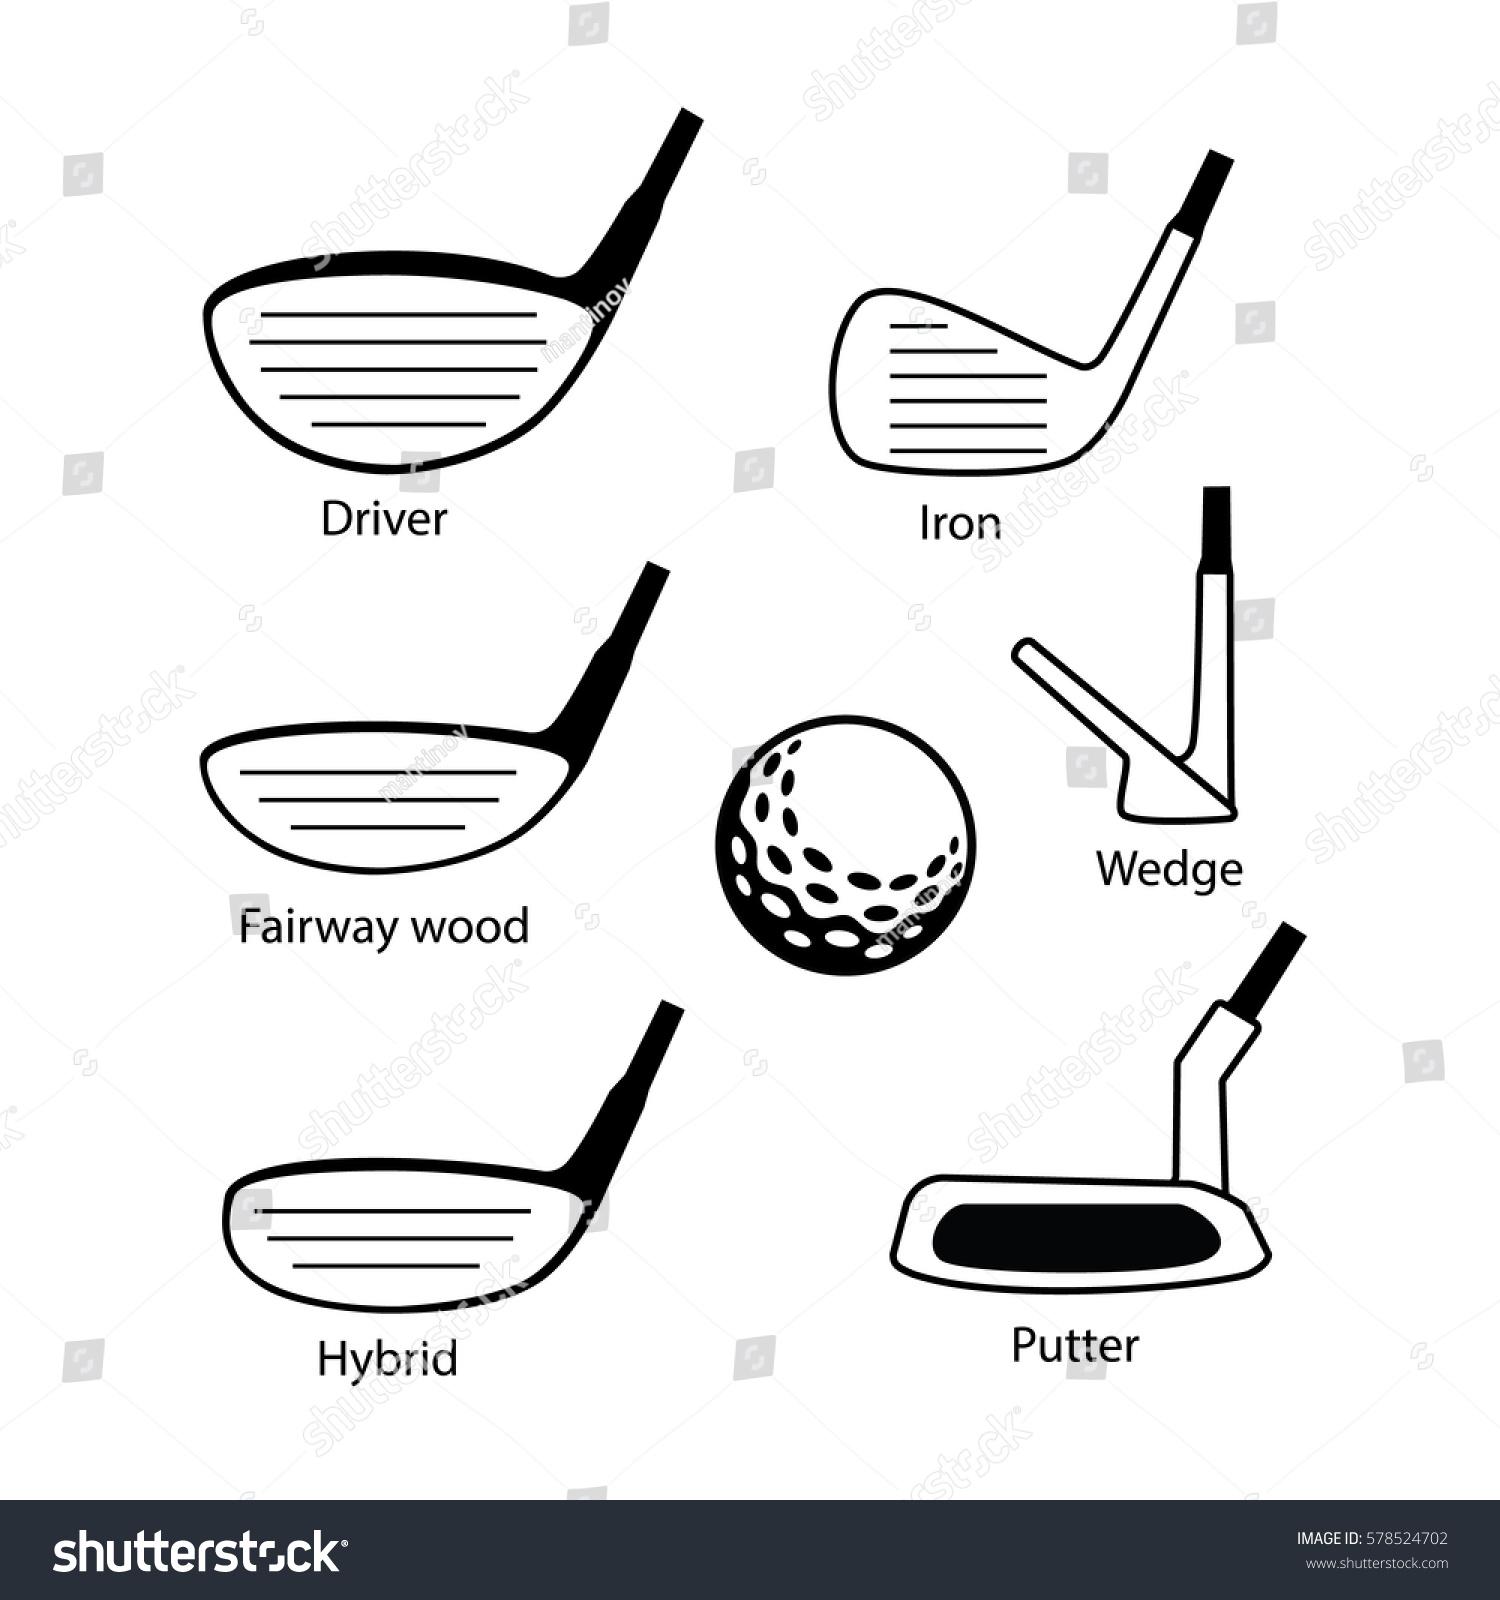 Diagram Of Golf Club Wood Art - Wiring Diagram For Light Switch •